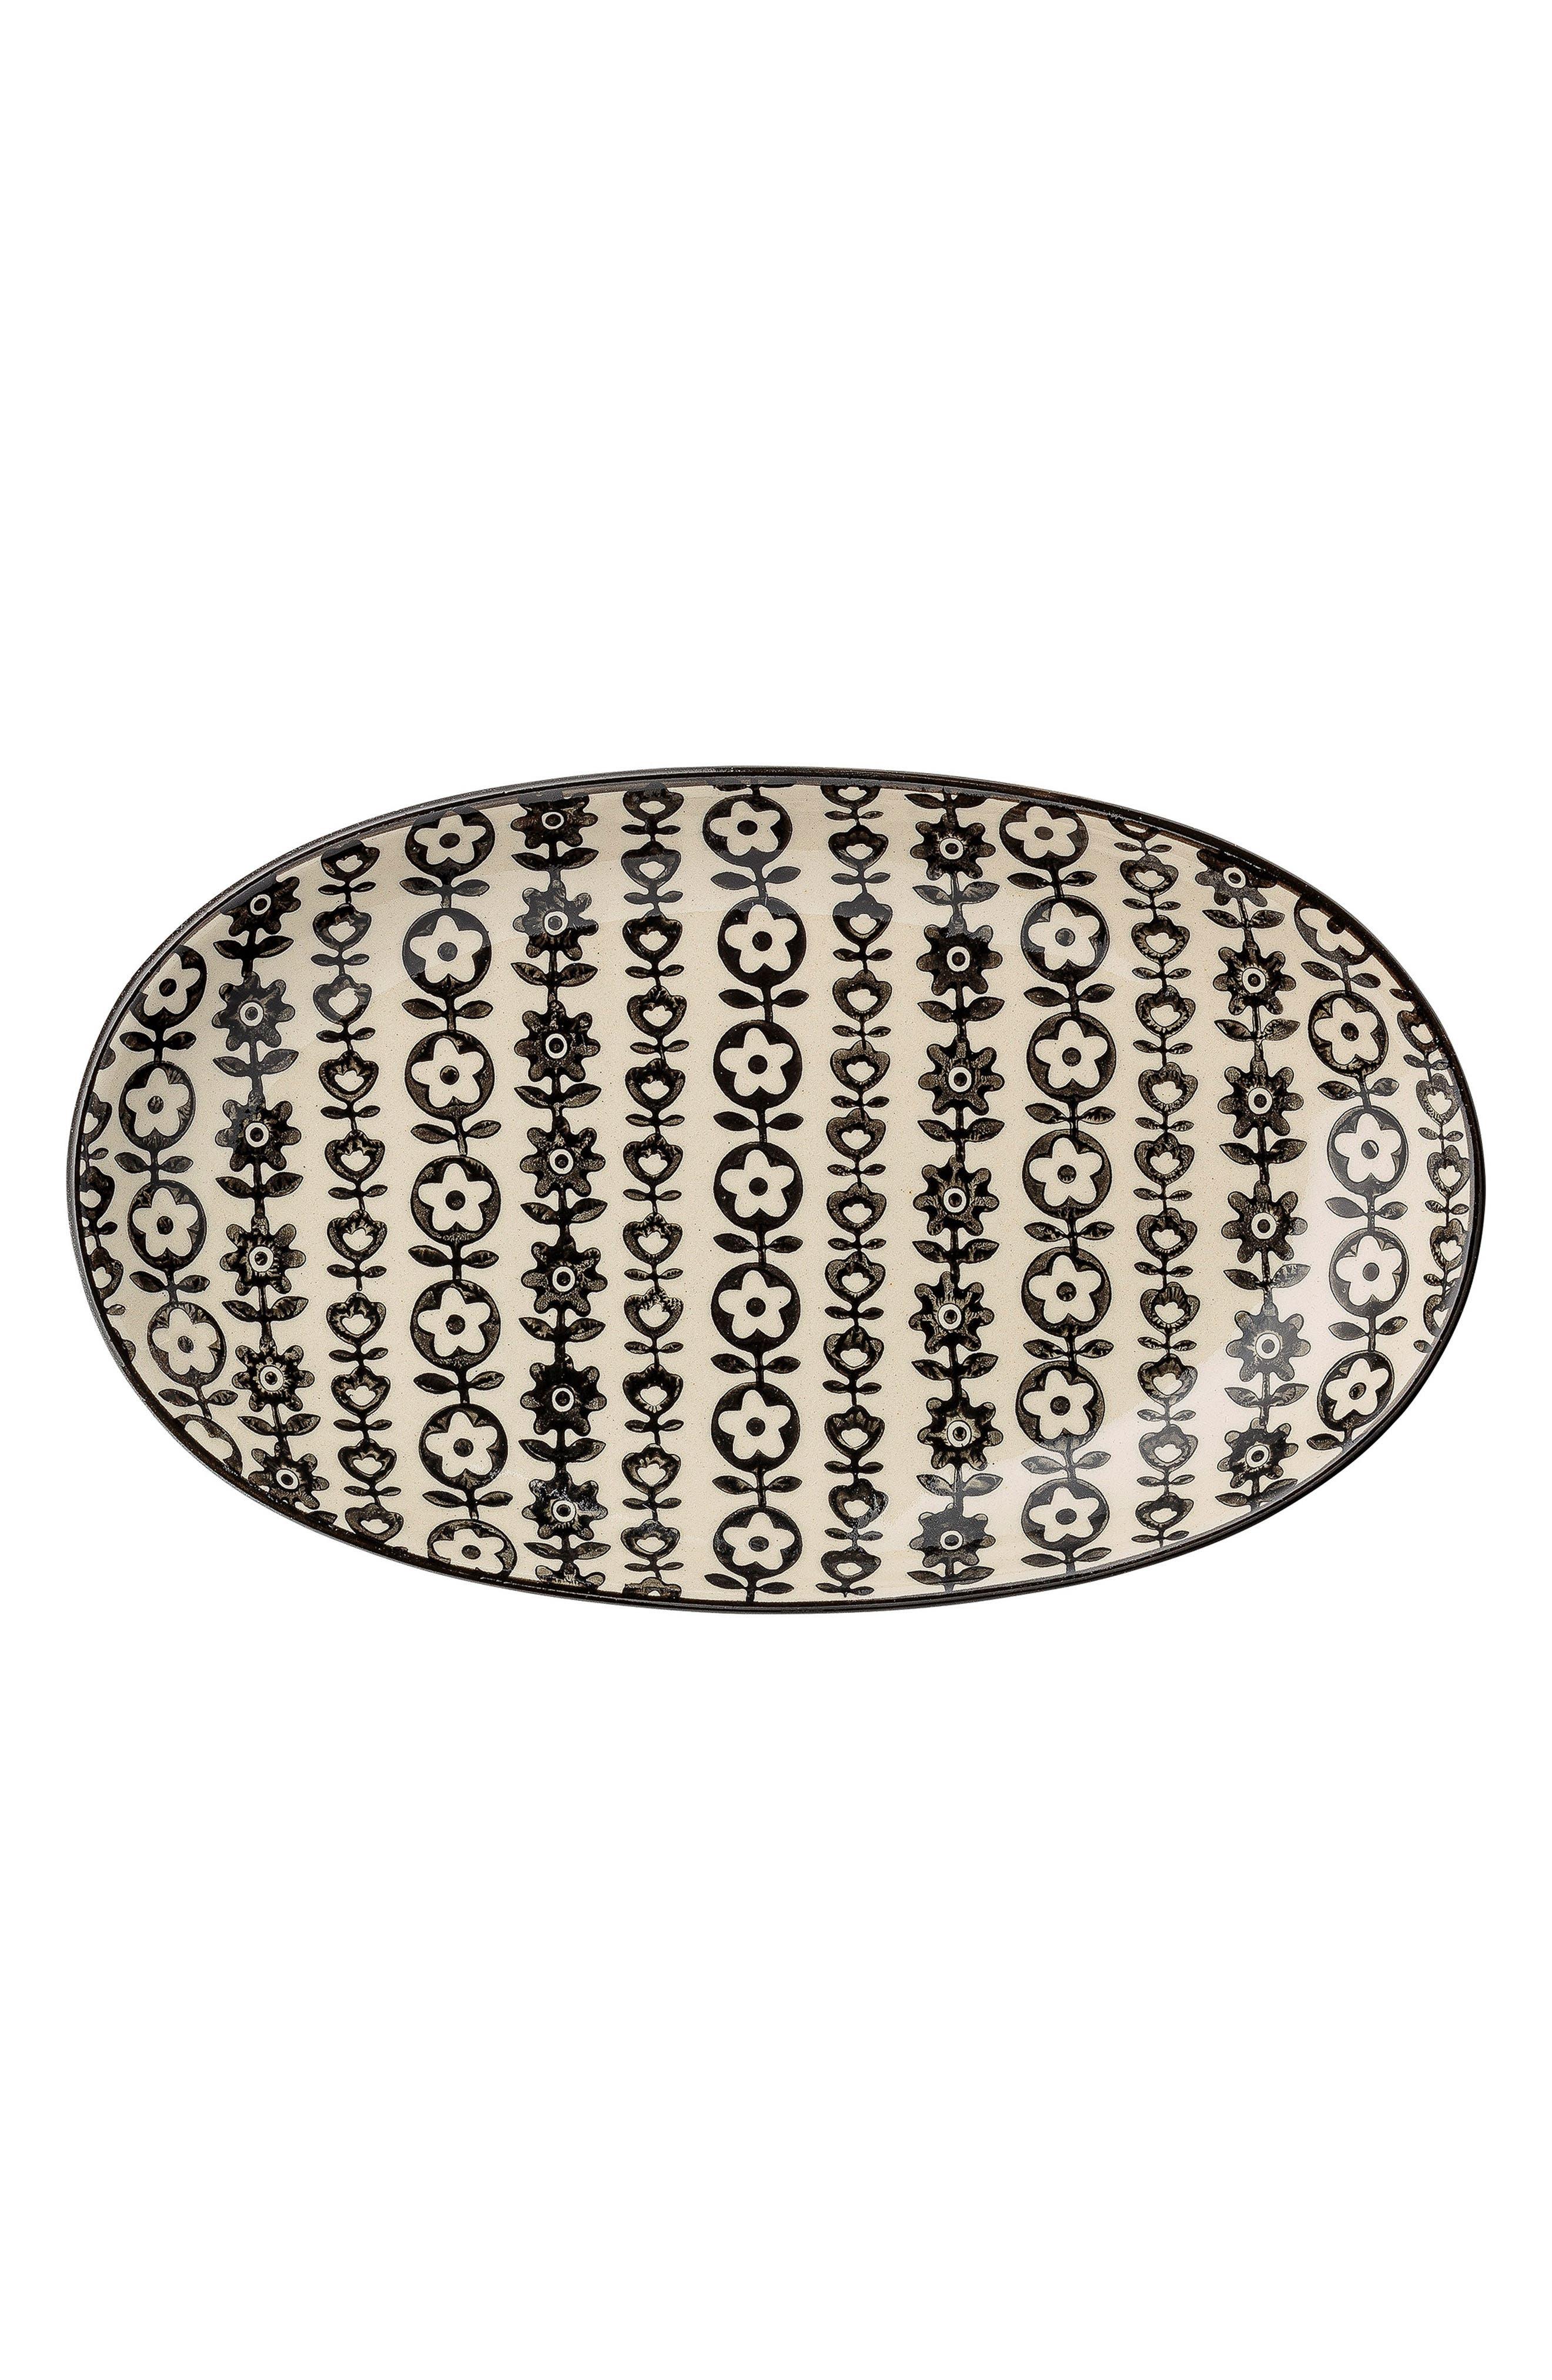 Main Image - Bloomingville Julie Oval Ceramic Platter